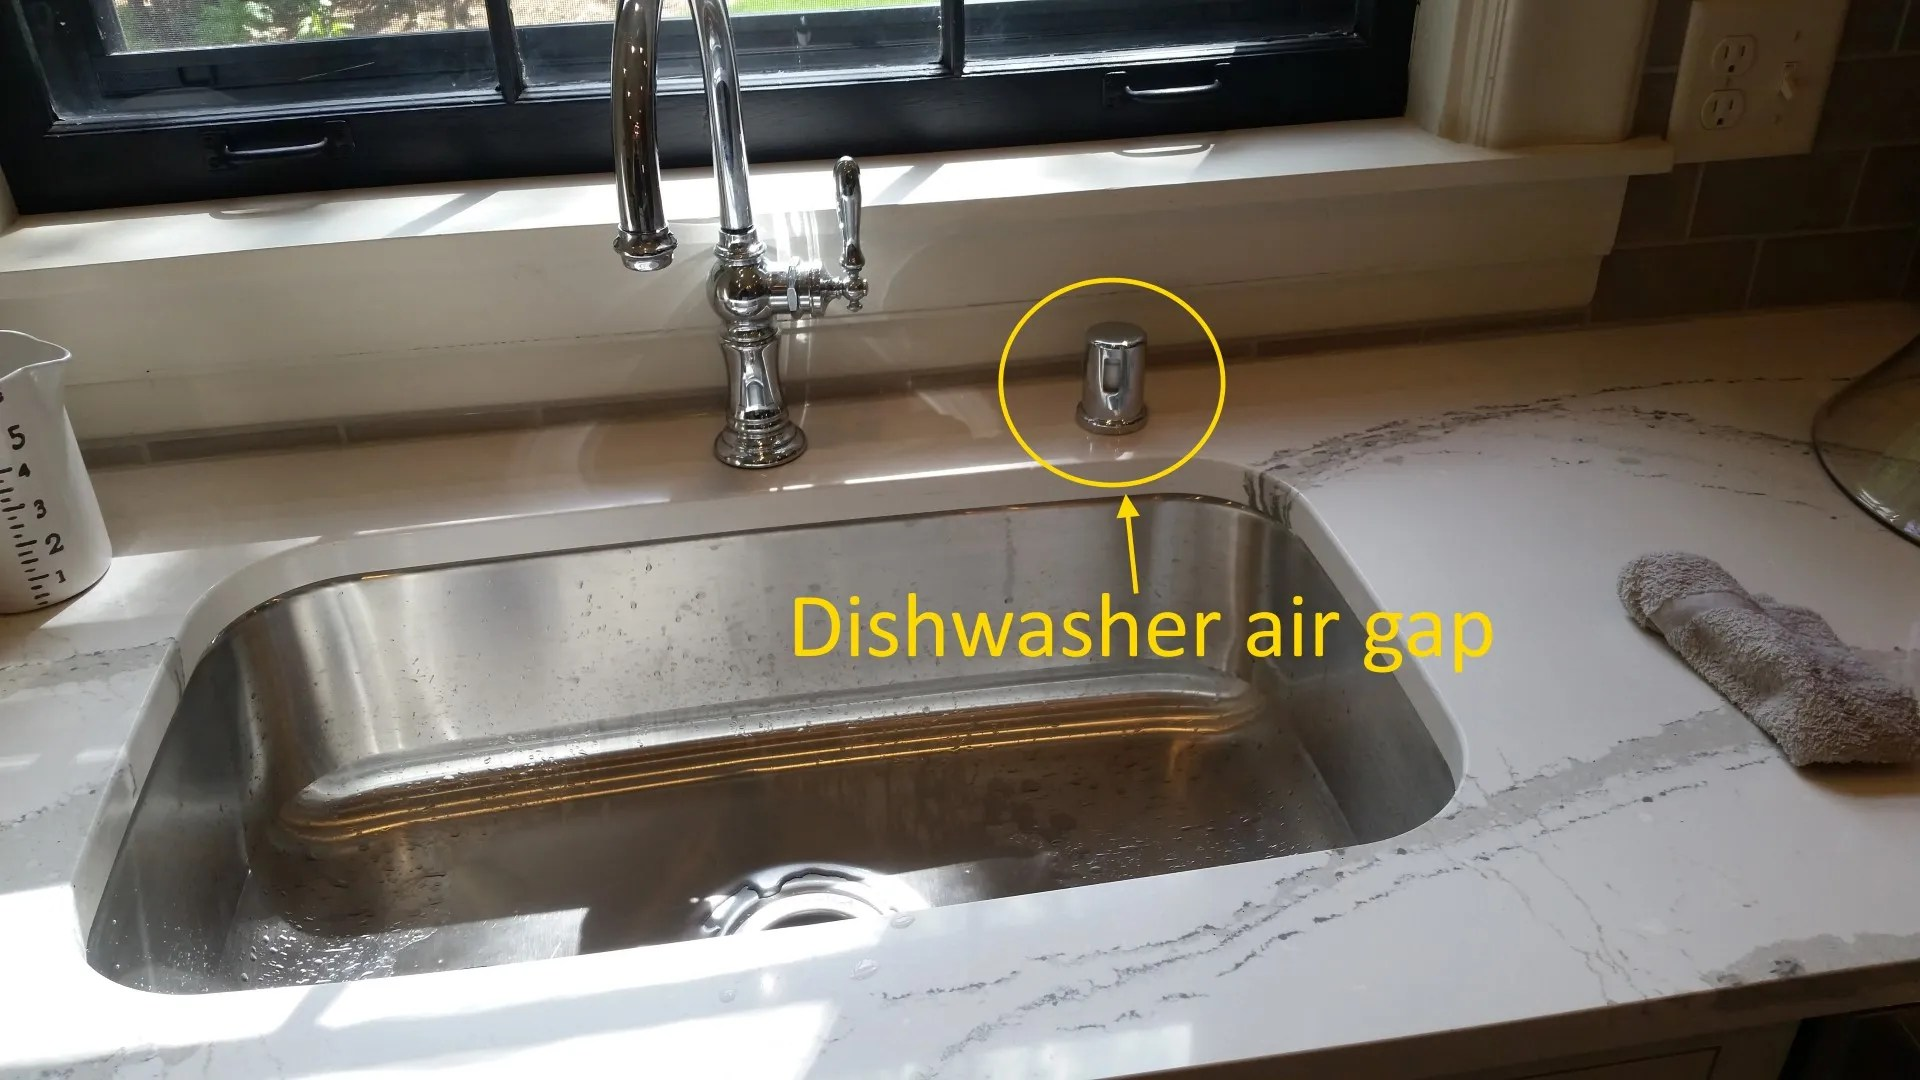 hight resolution of dishwasher air gap